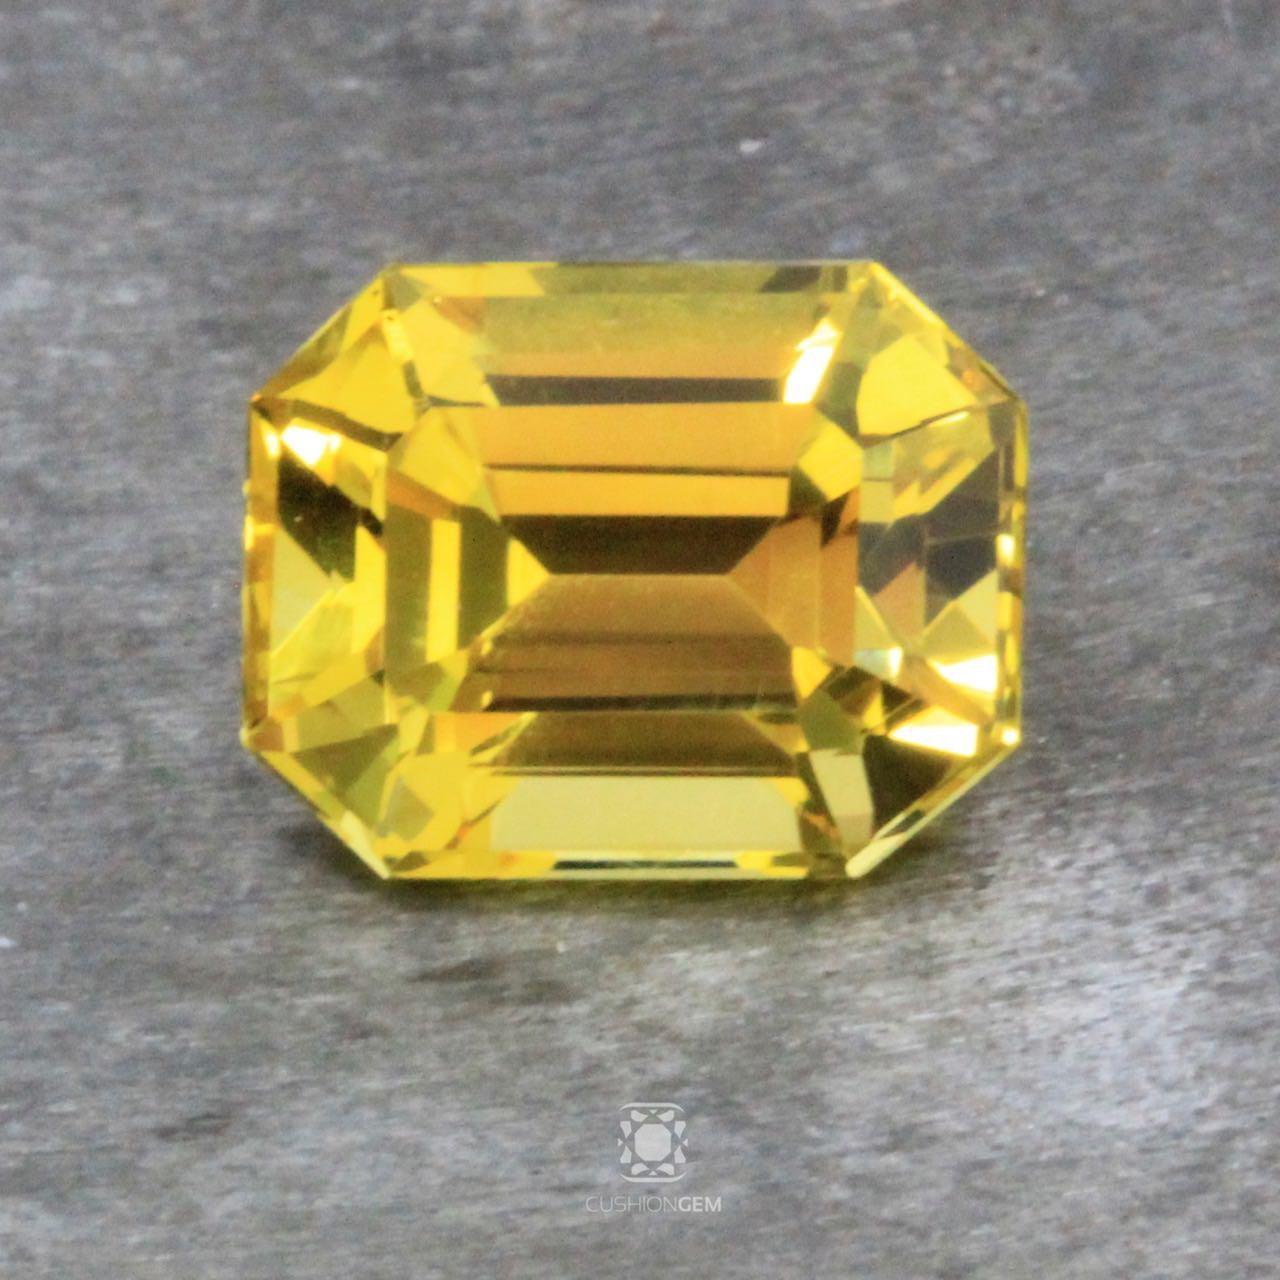 7.02 Emerald Cut Un-heated Yellow Sapphire